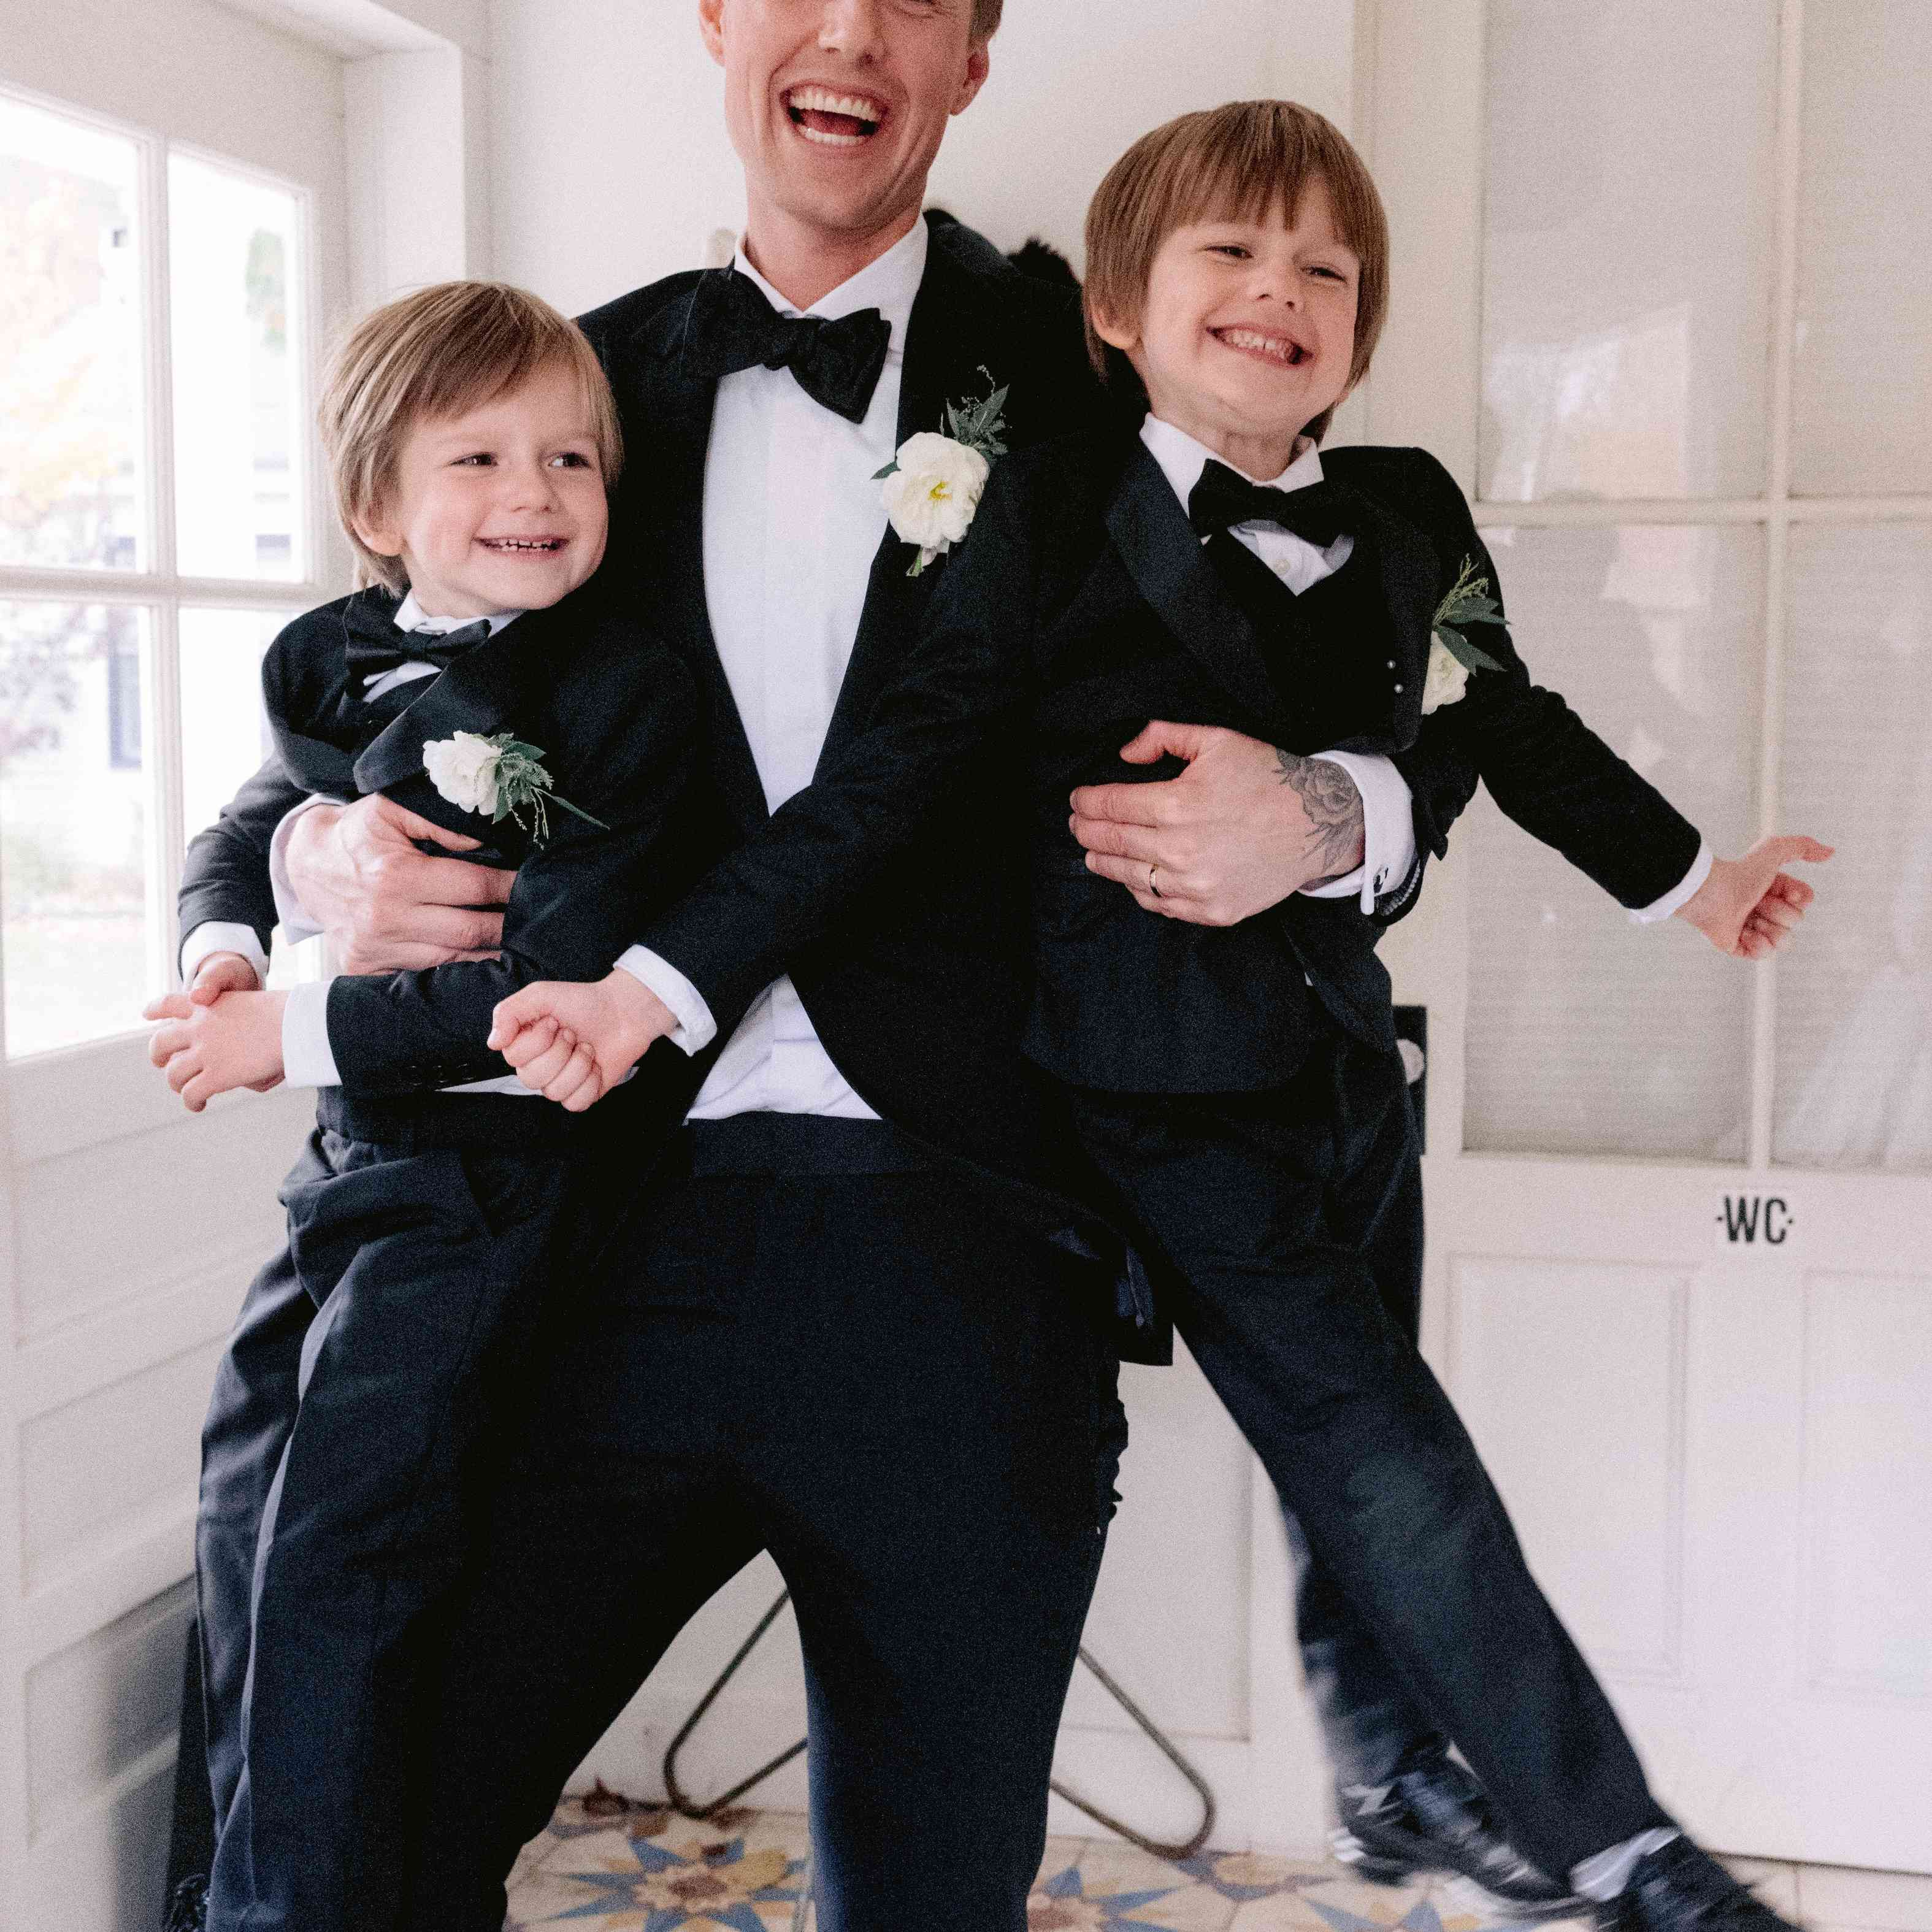 Groom and kids